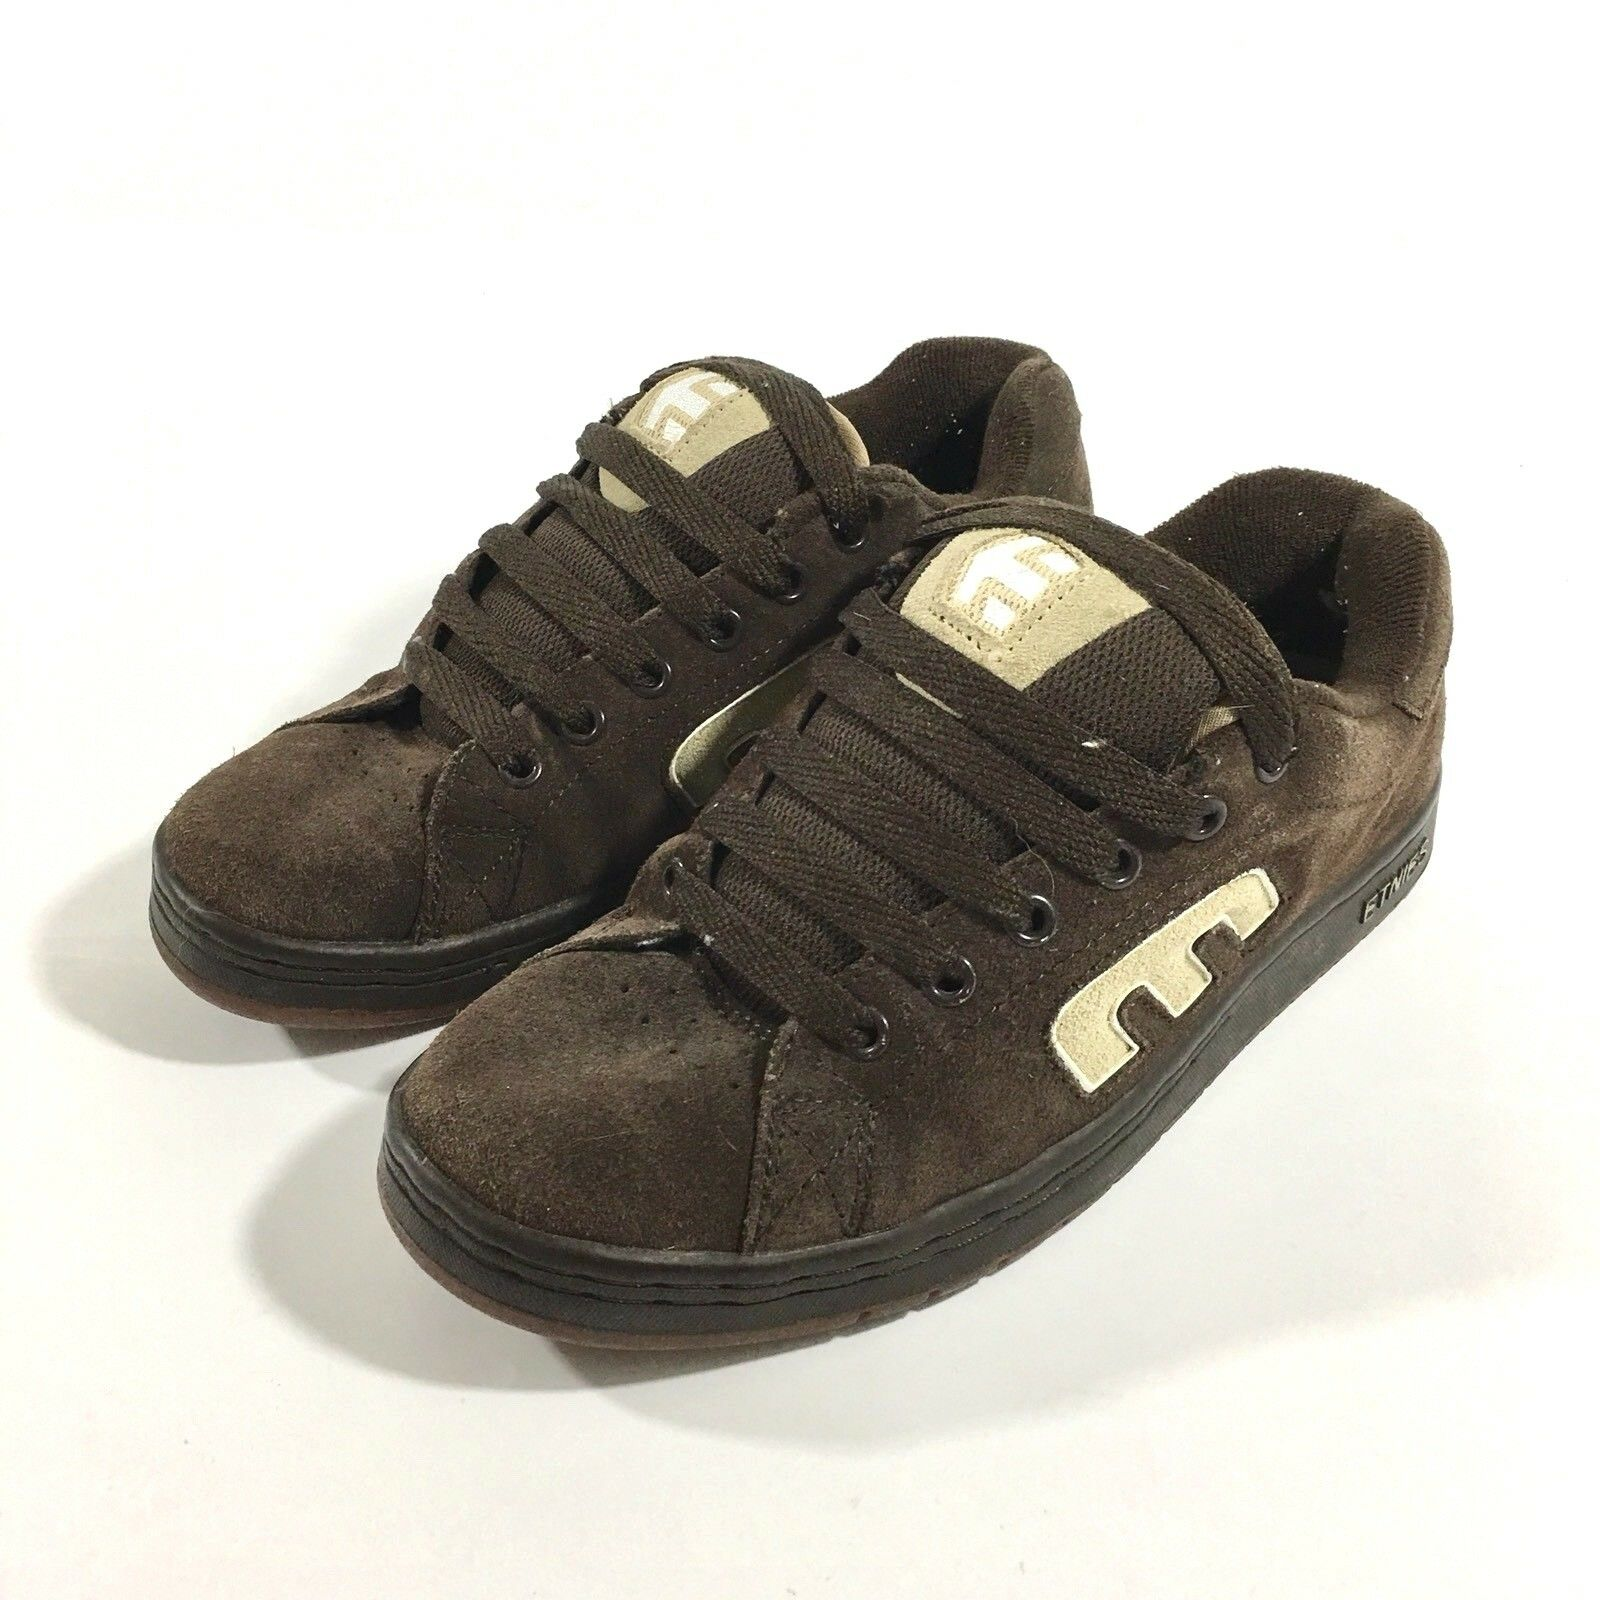 93123a5088bc ETNIES Callicut Mens Size 7.5 7.5 7.5 Skateboard Shoes Brown Suede Tan  Lettering 87b88a